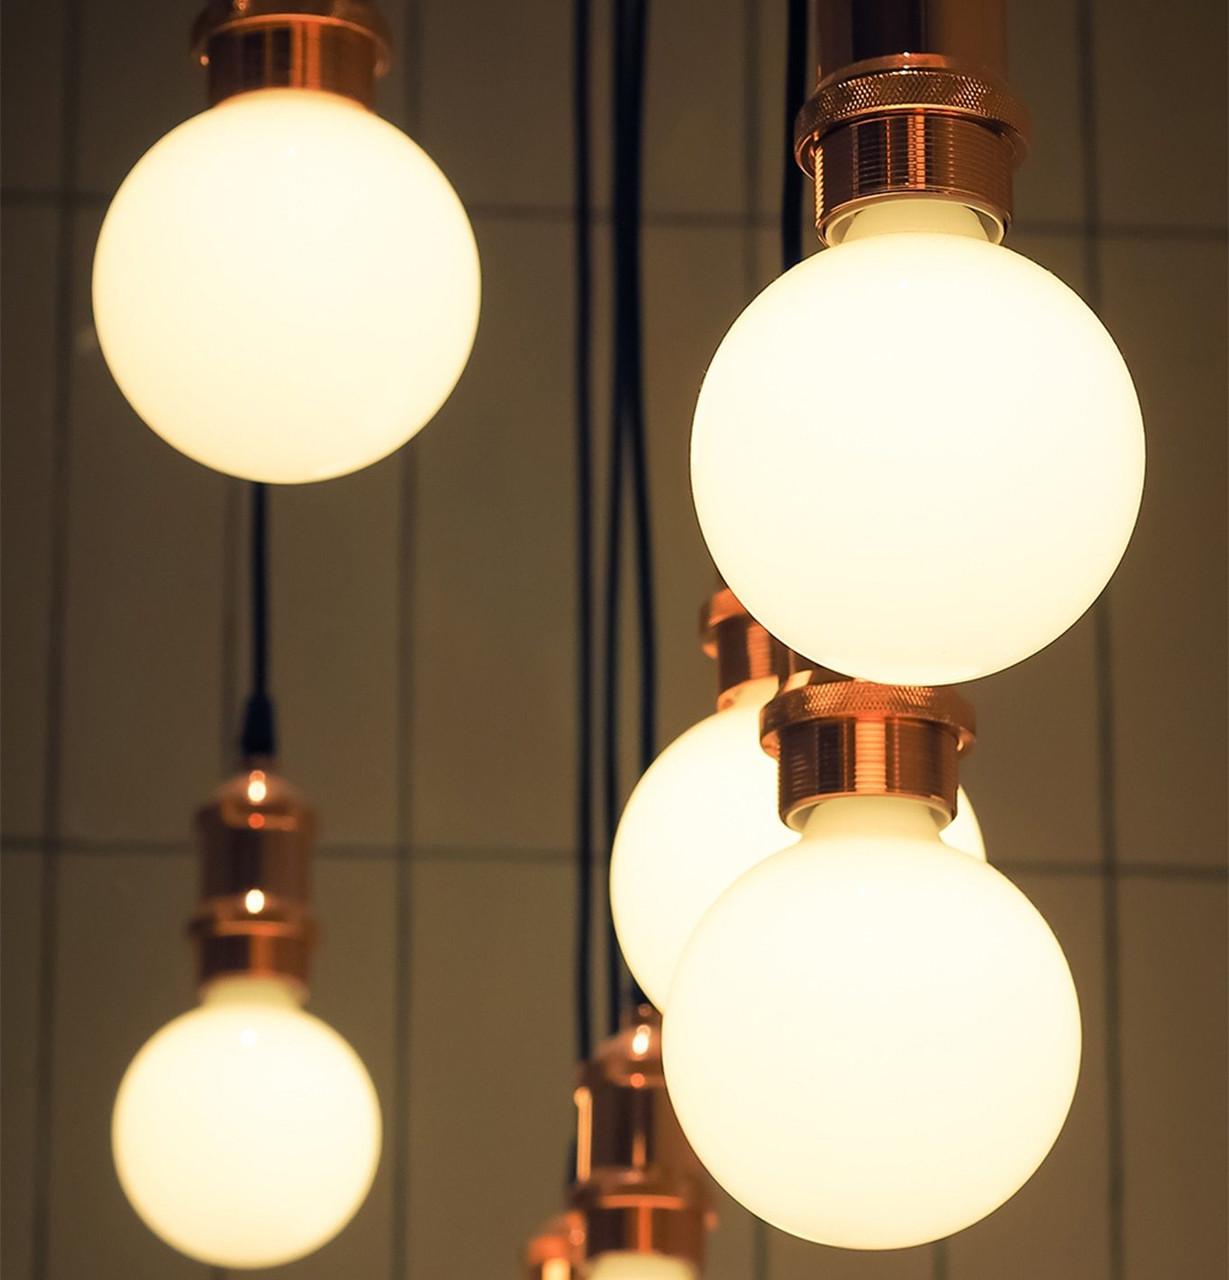 LED Dimmable G95 IP20 Light Bulbs